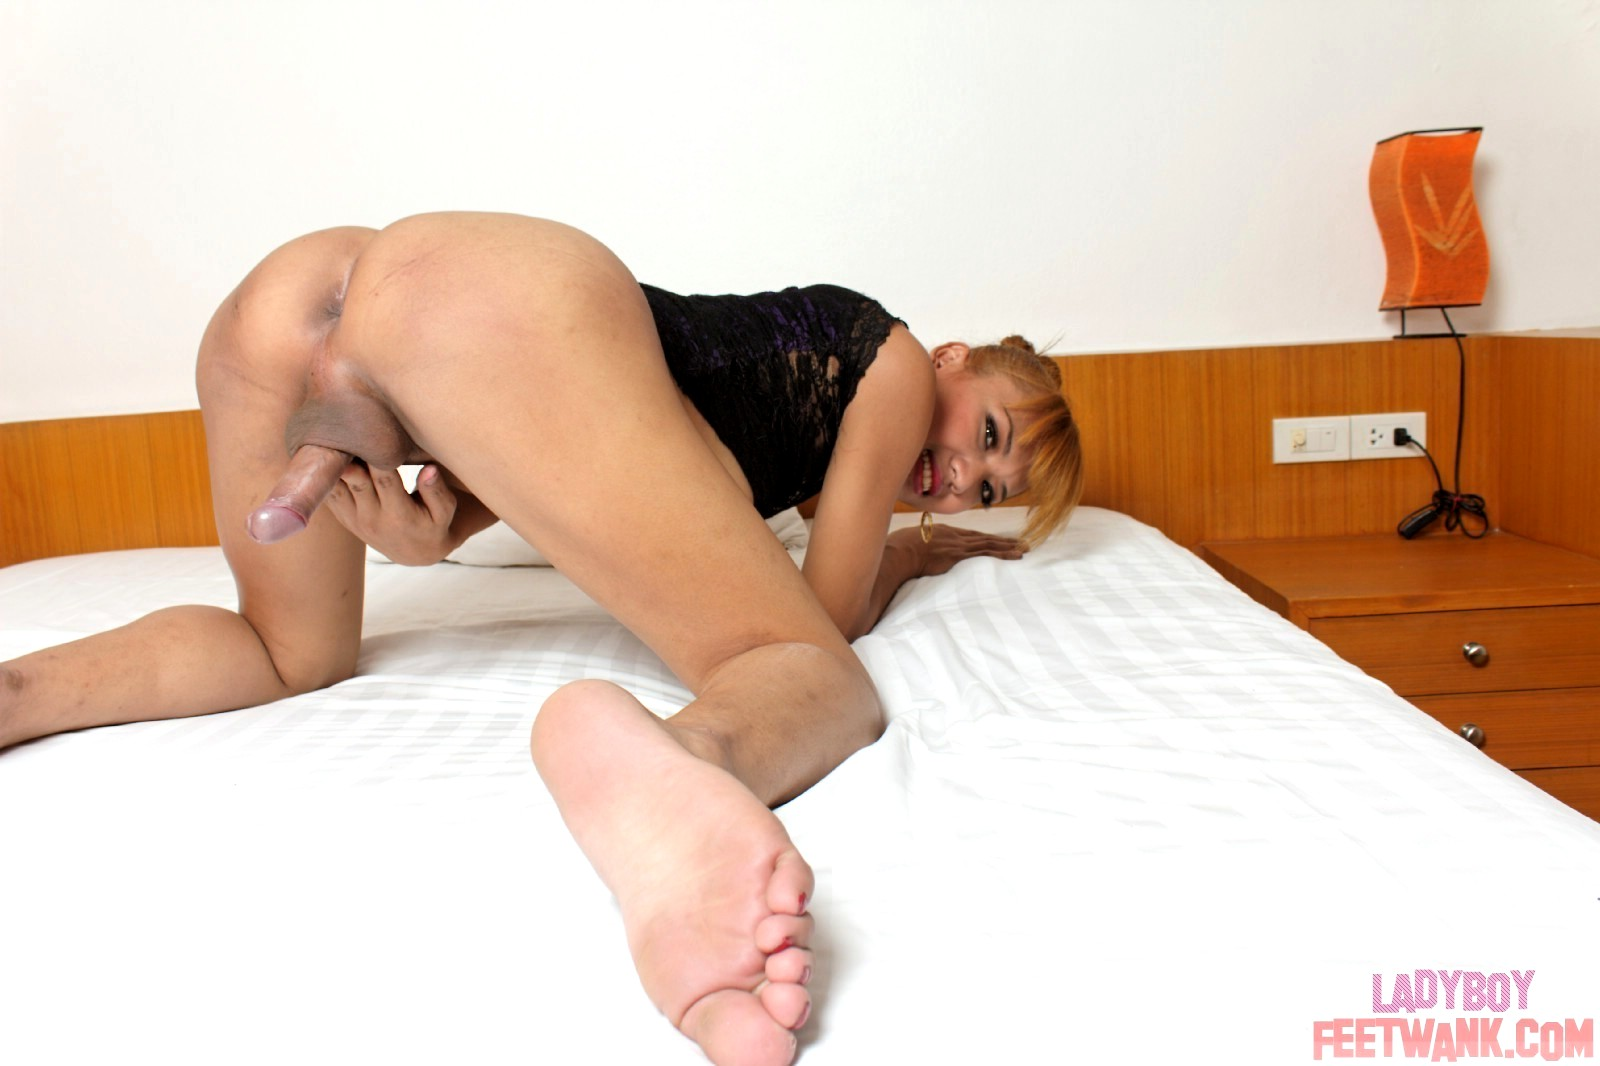 Love ladyboy foot anal pic